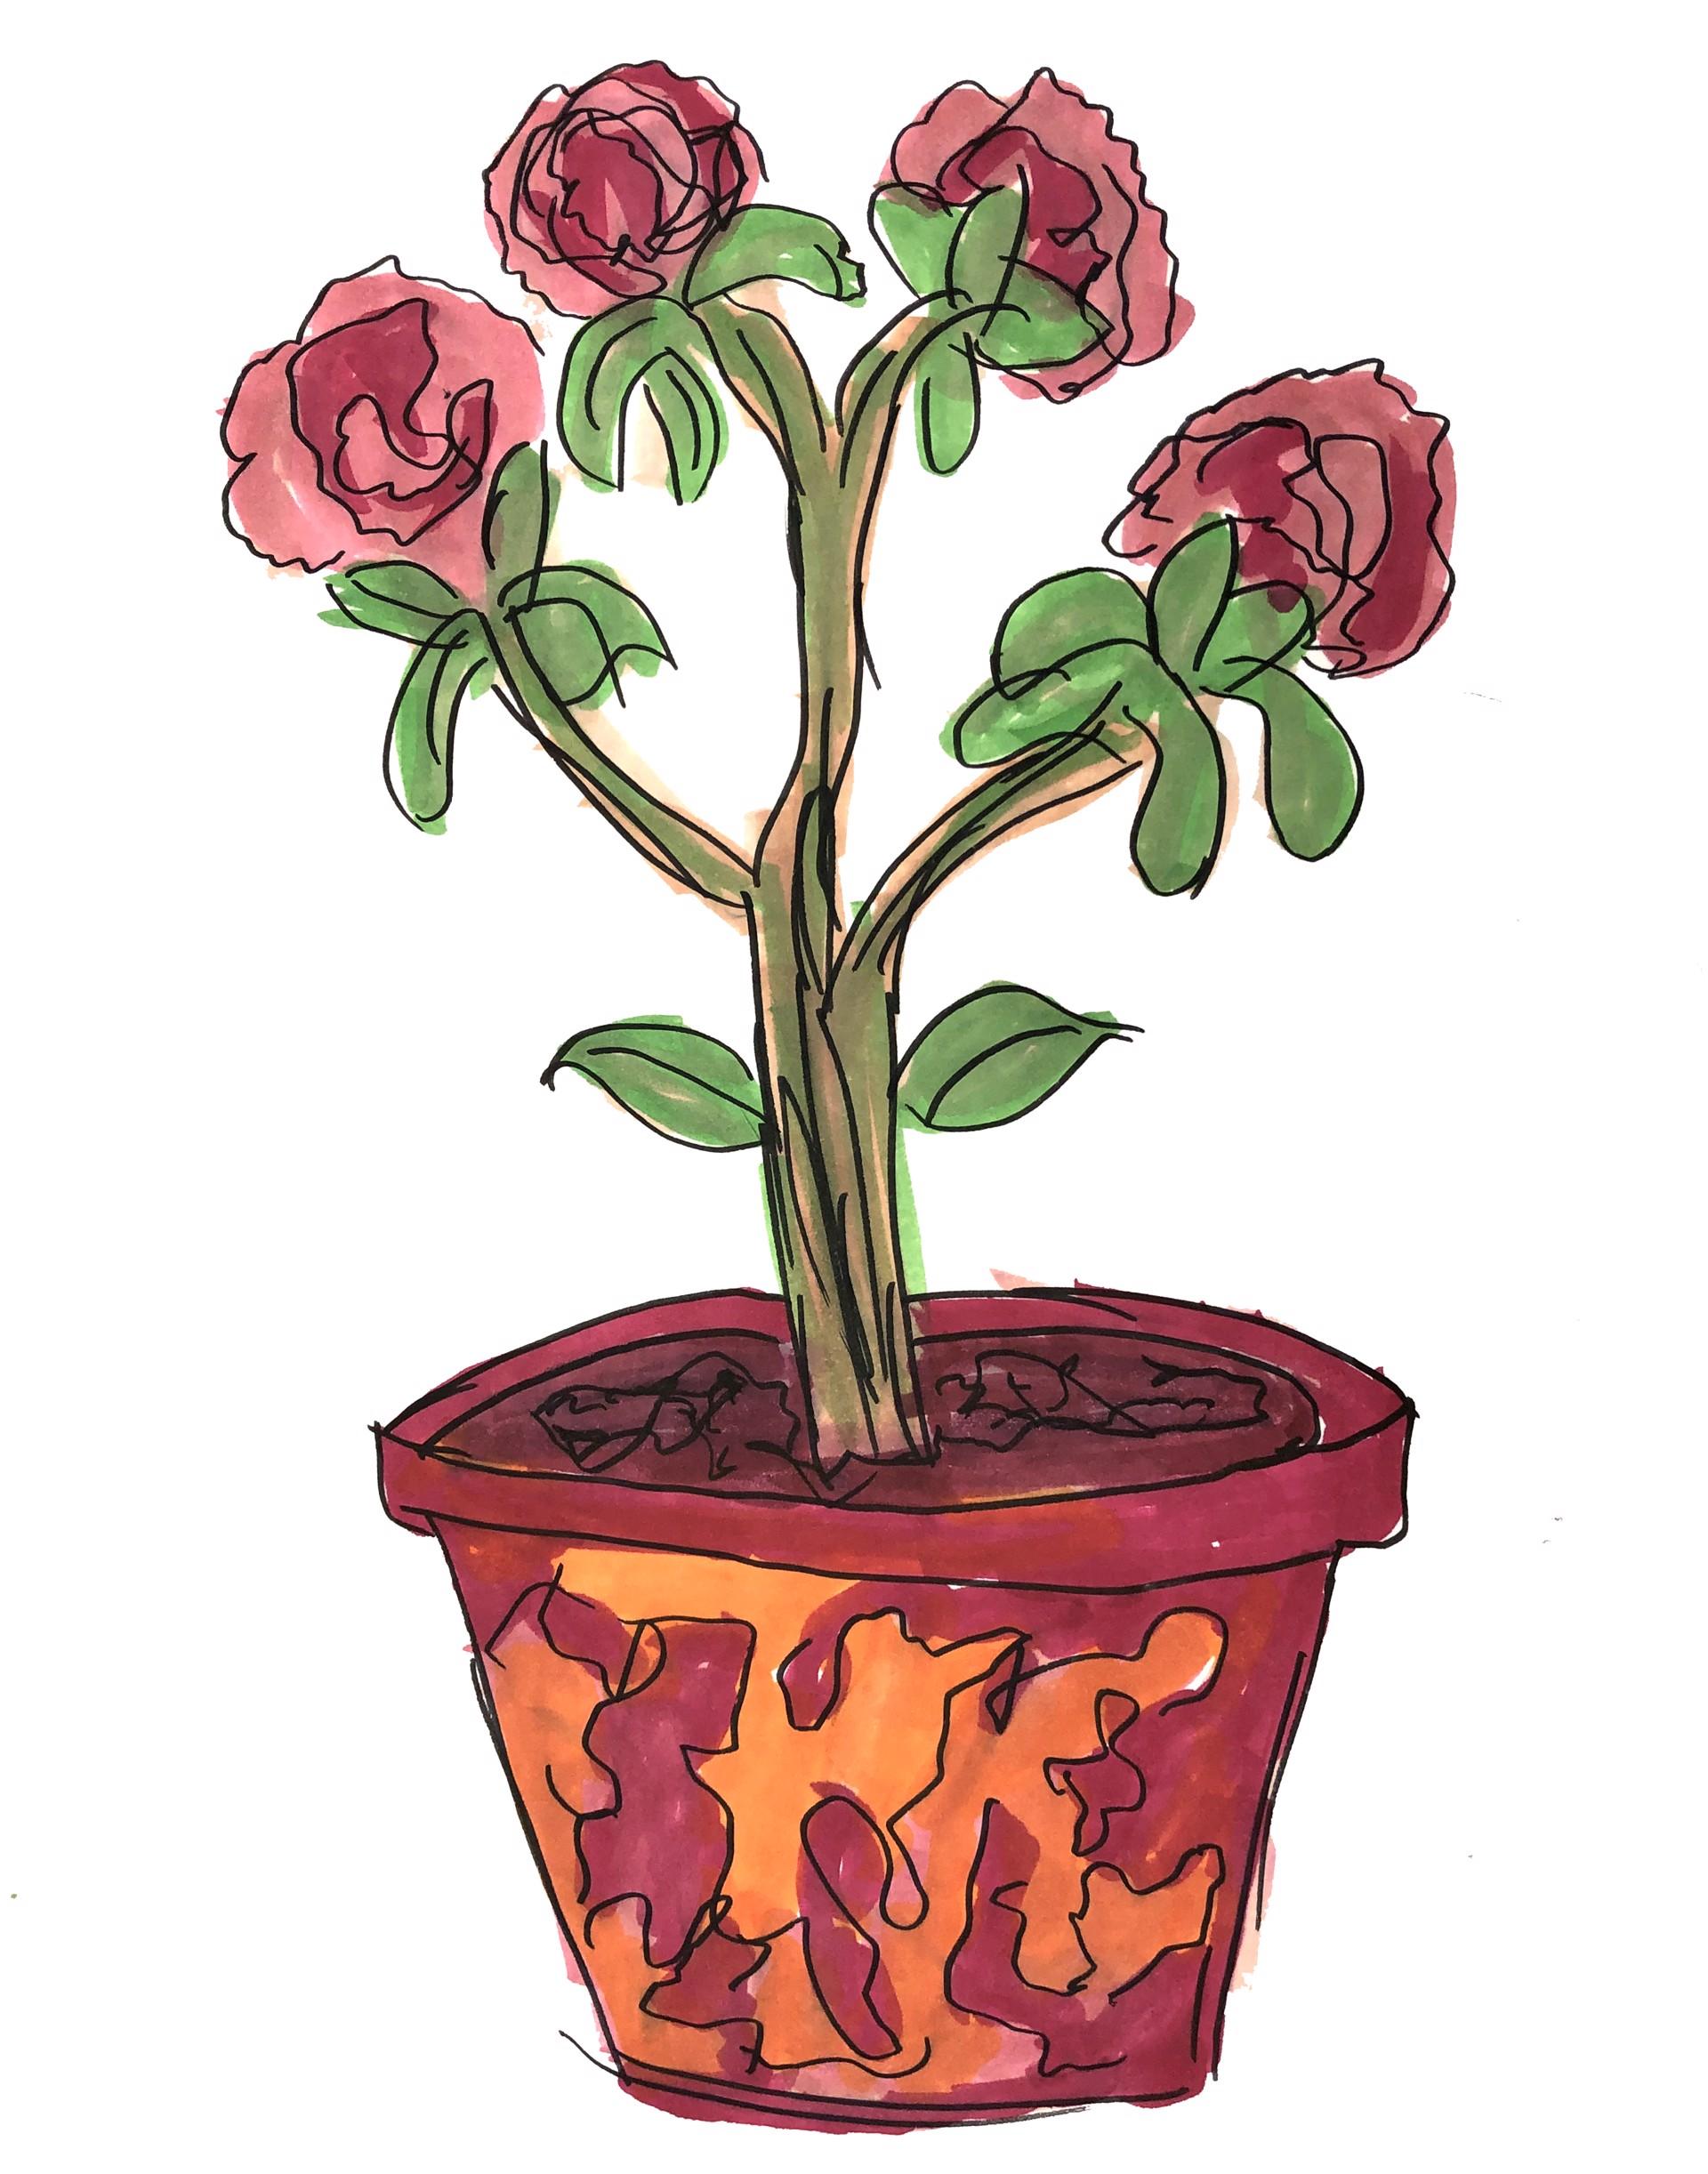 Flower Pot by Nonja Tiller